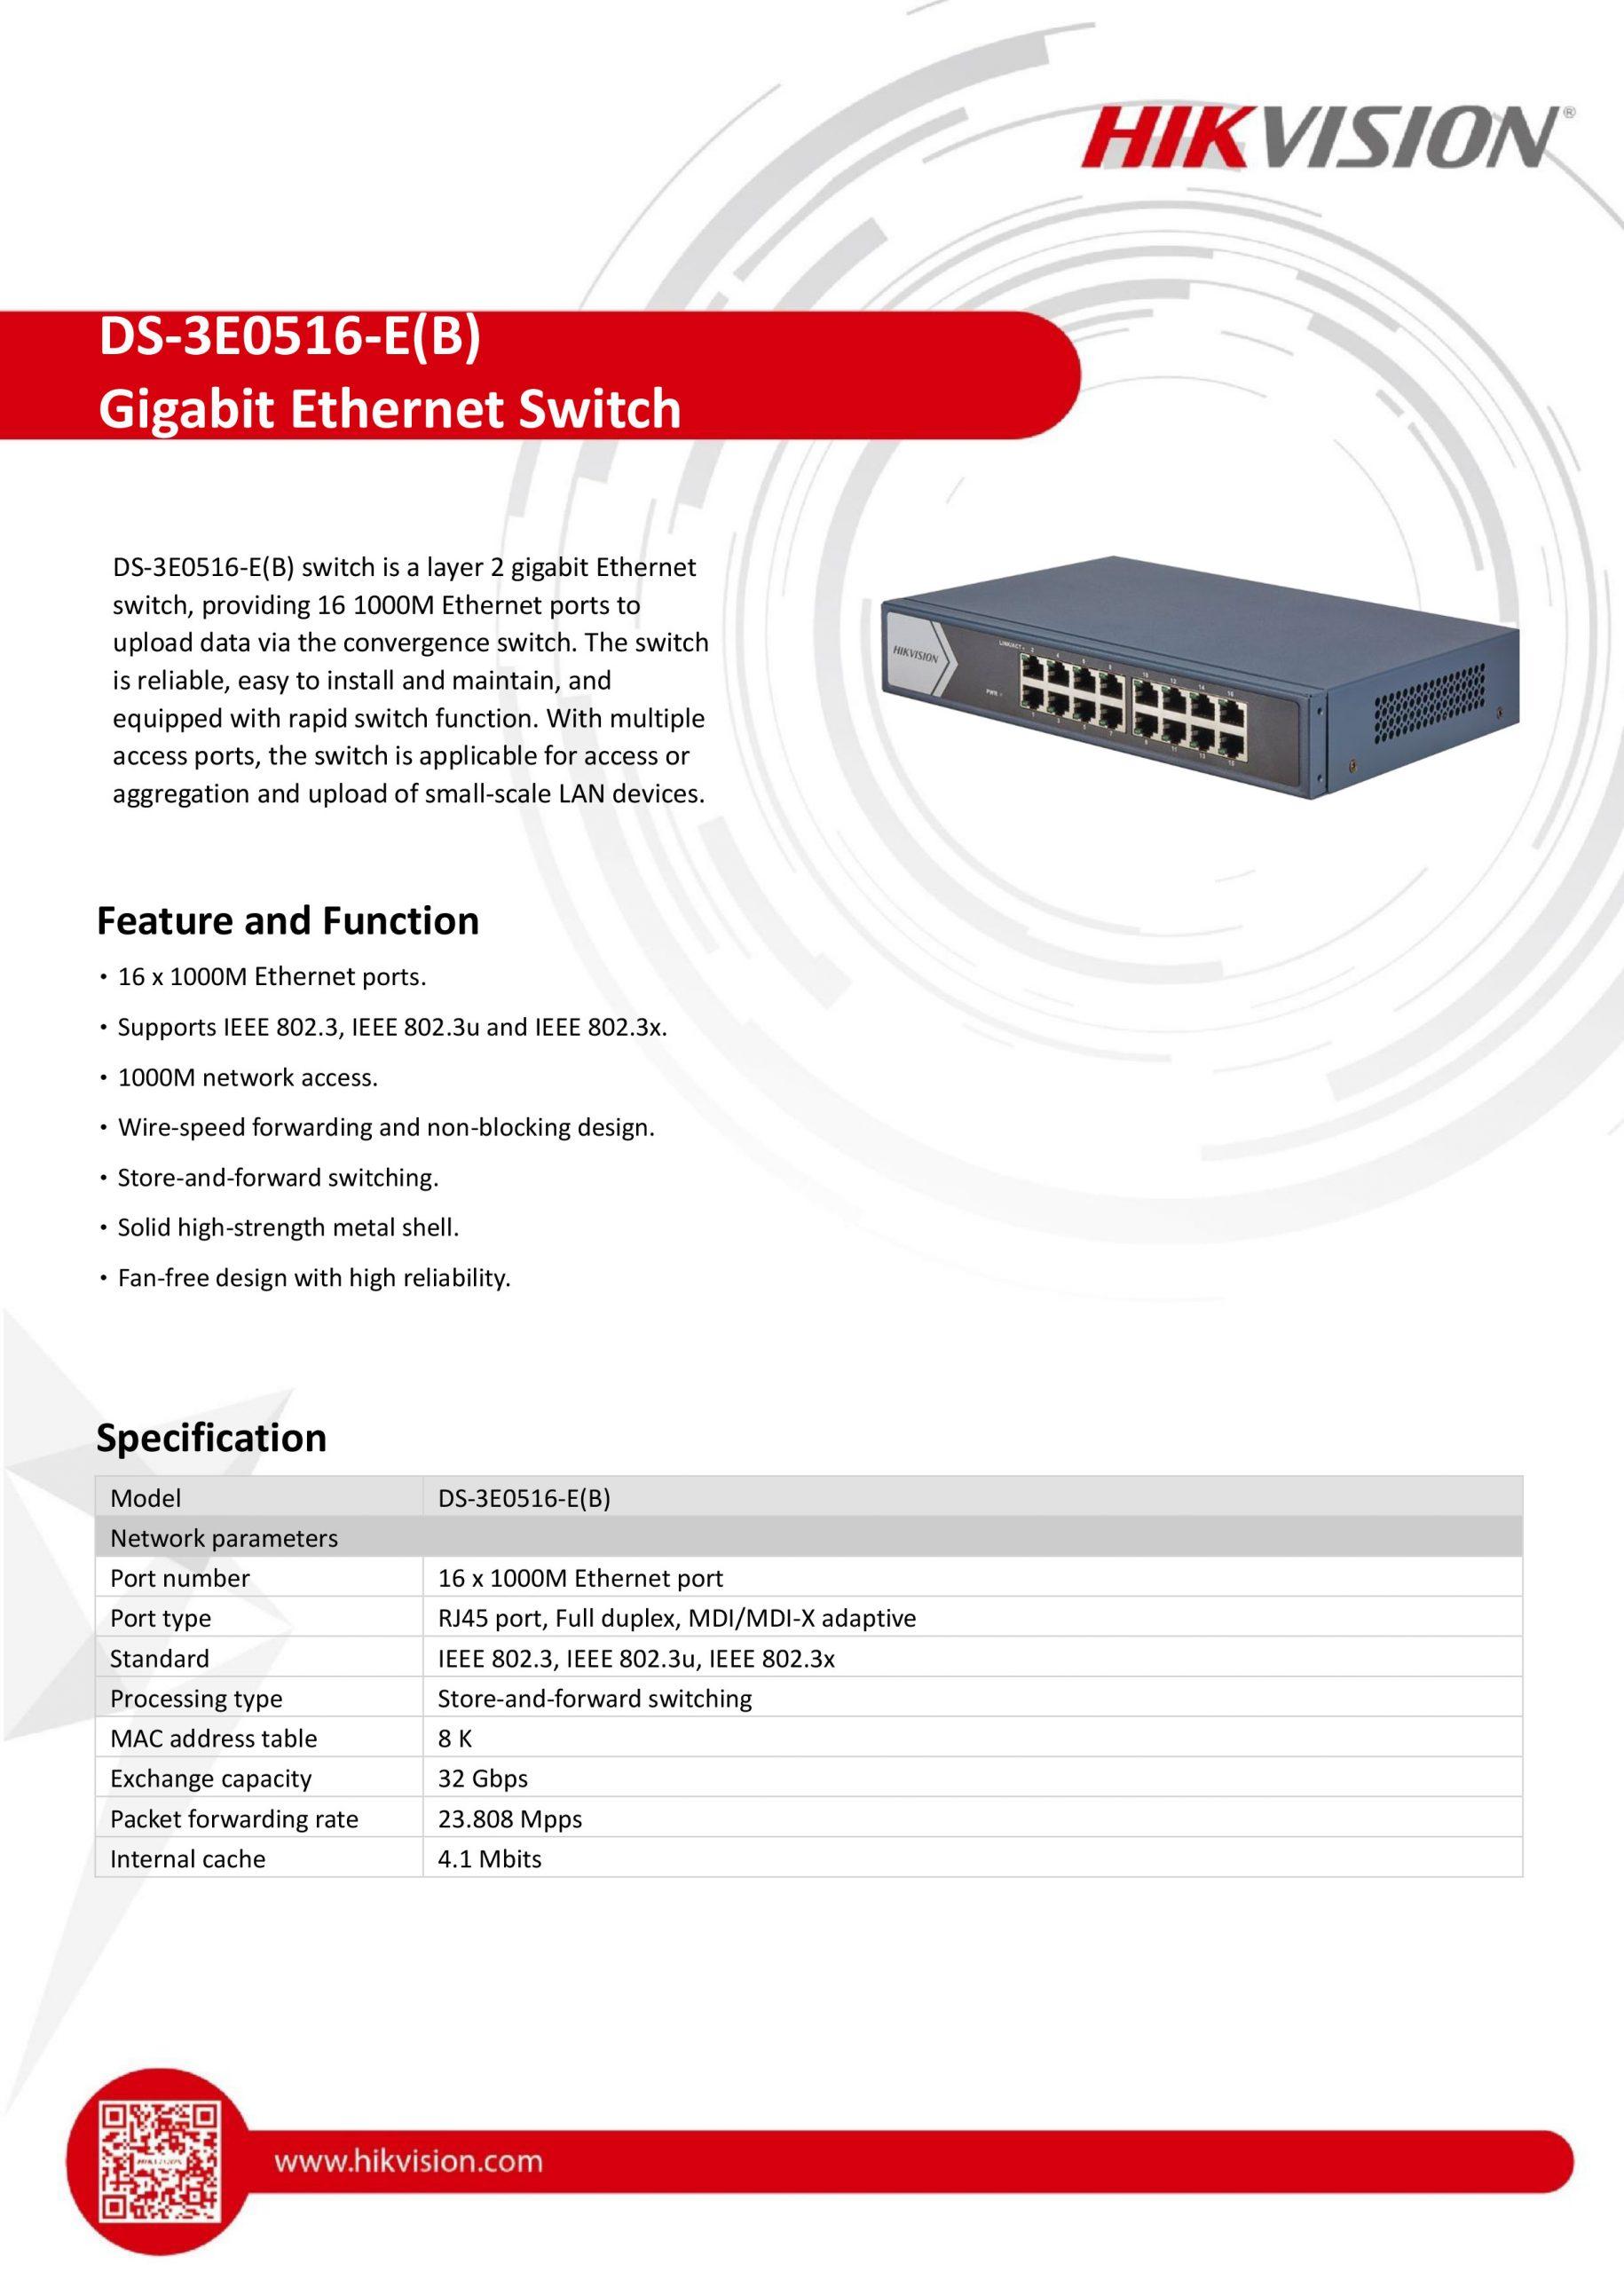 16-Port Gigabit Switch - DS-3E0516-E